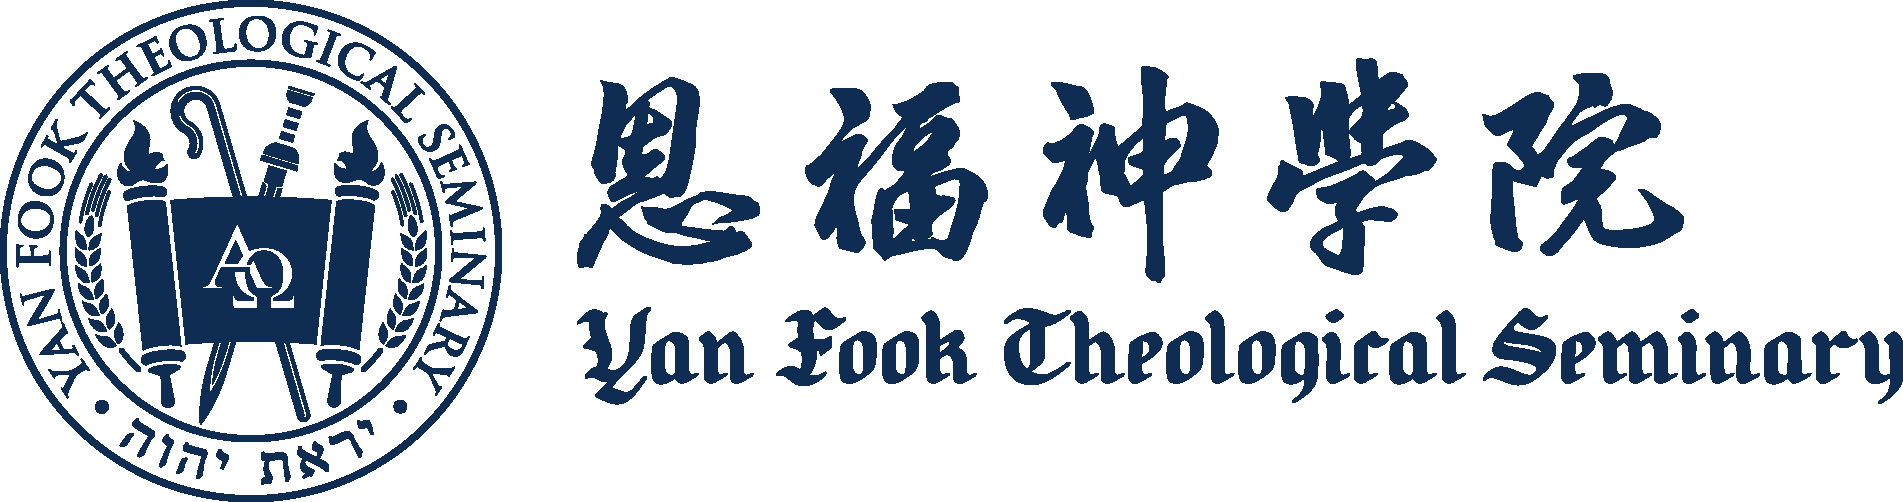 Yan Fook Theological Seminary